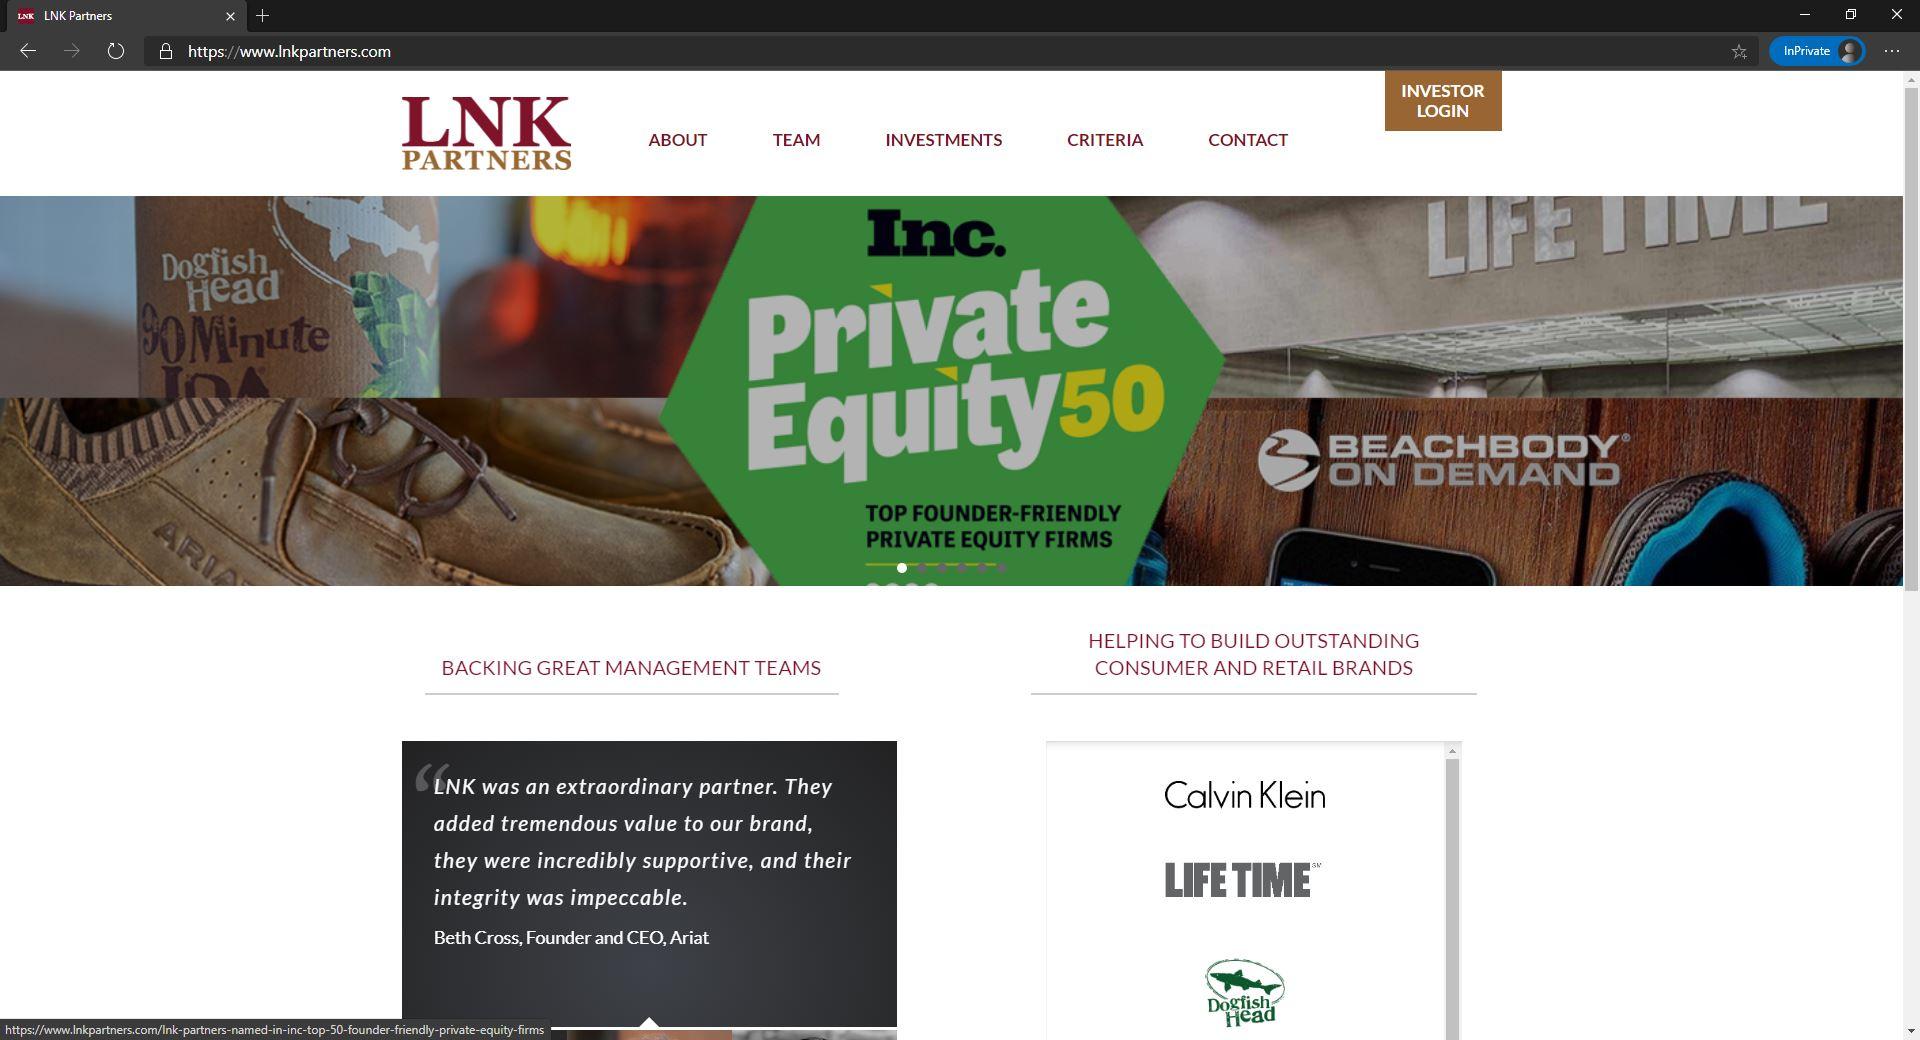 LNK Partners website